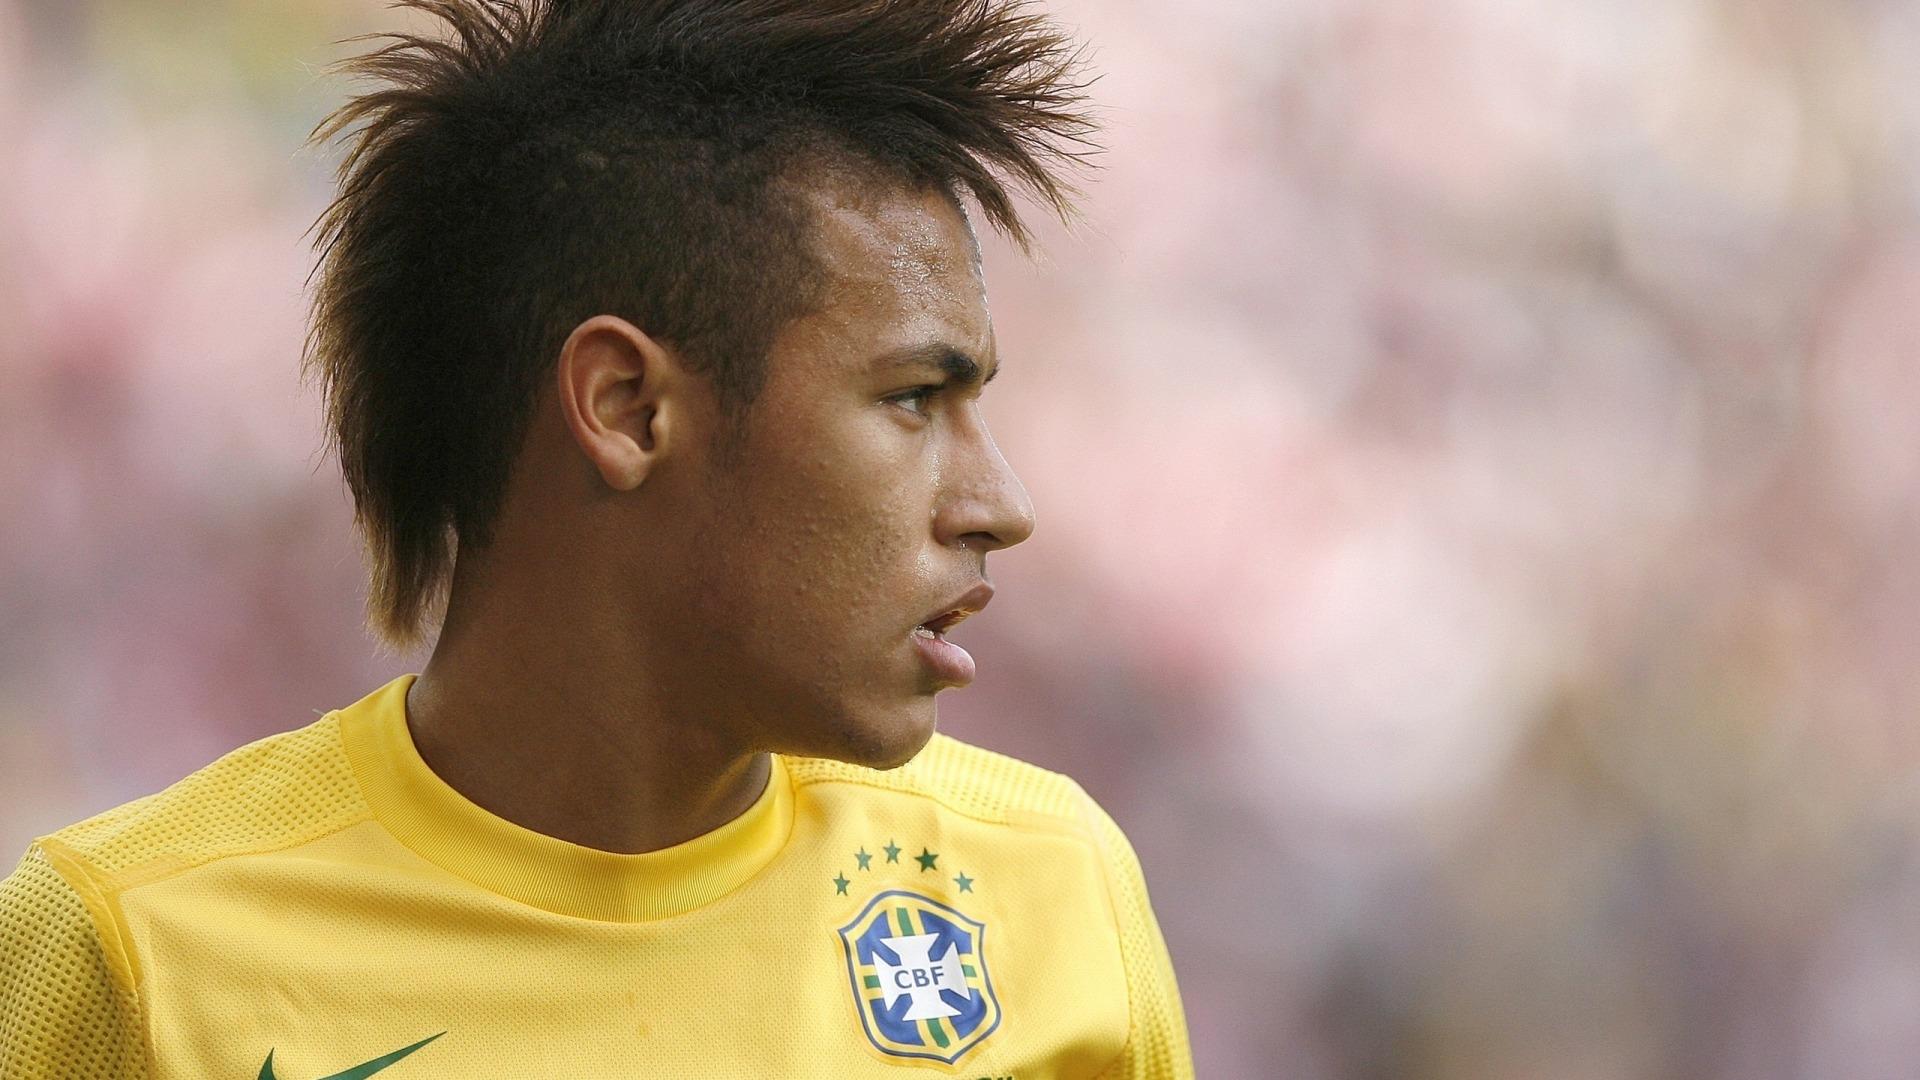 Neymar Brazil Football Team HD HD Wallpaper